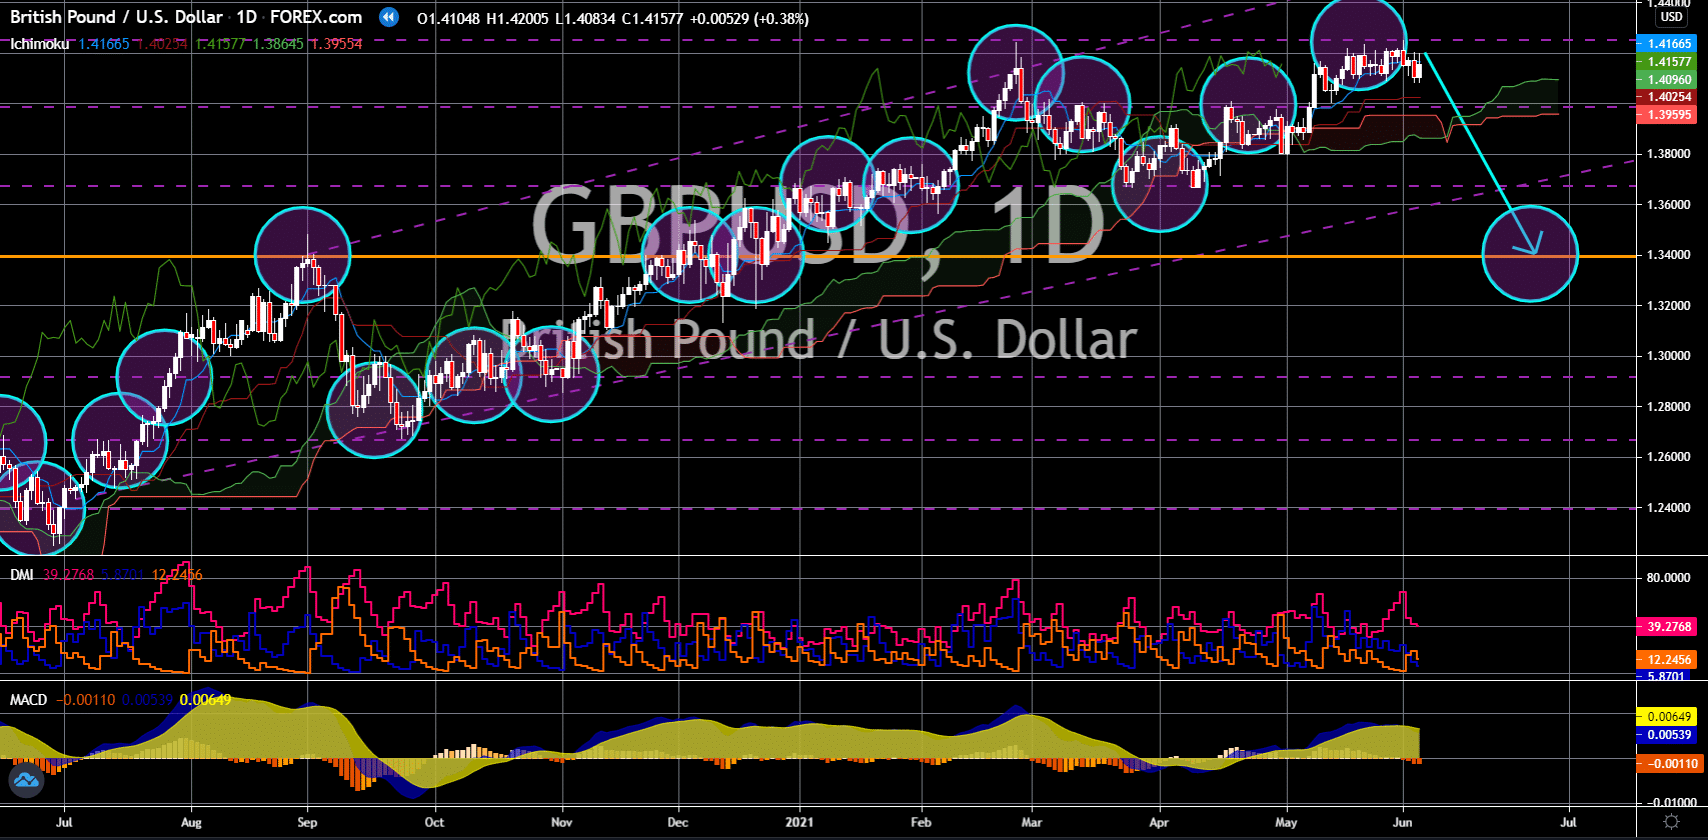 FinanceBrokerage - Notícias do Mercado: Gráfico GBP/USD